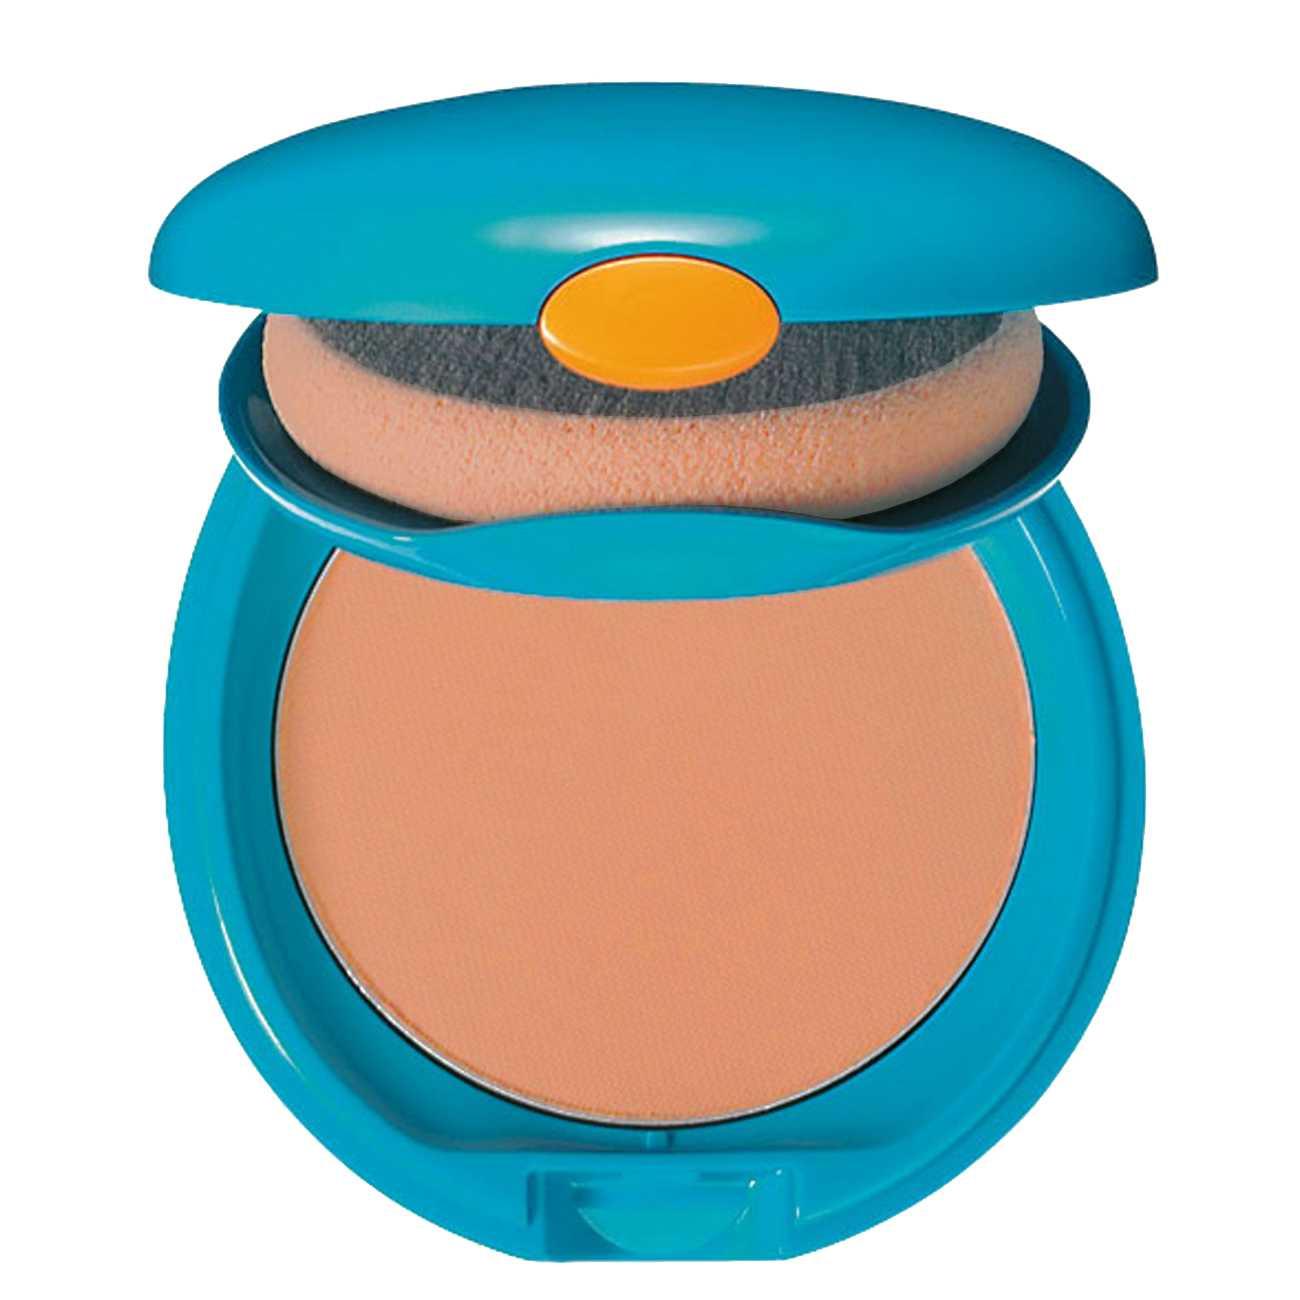 UV PROTECTIVE COMPACT FOUNDATION 12 G Medium Beige